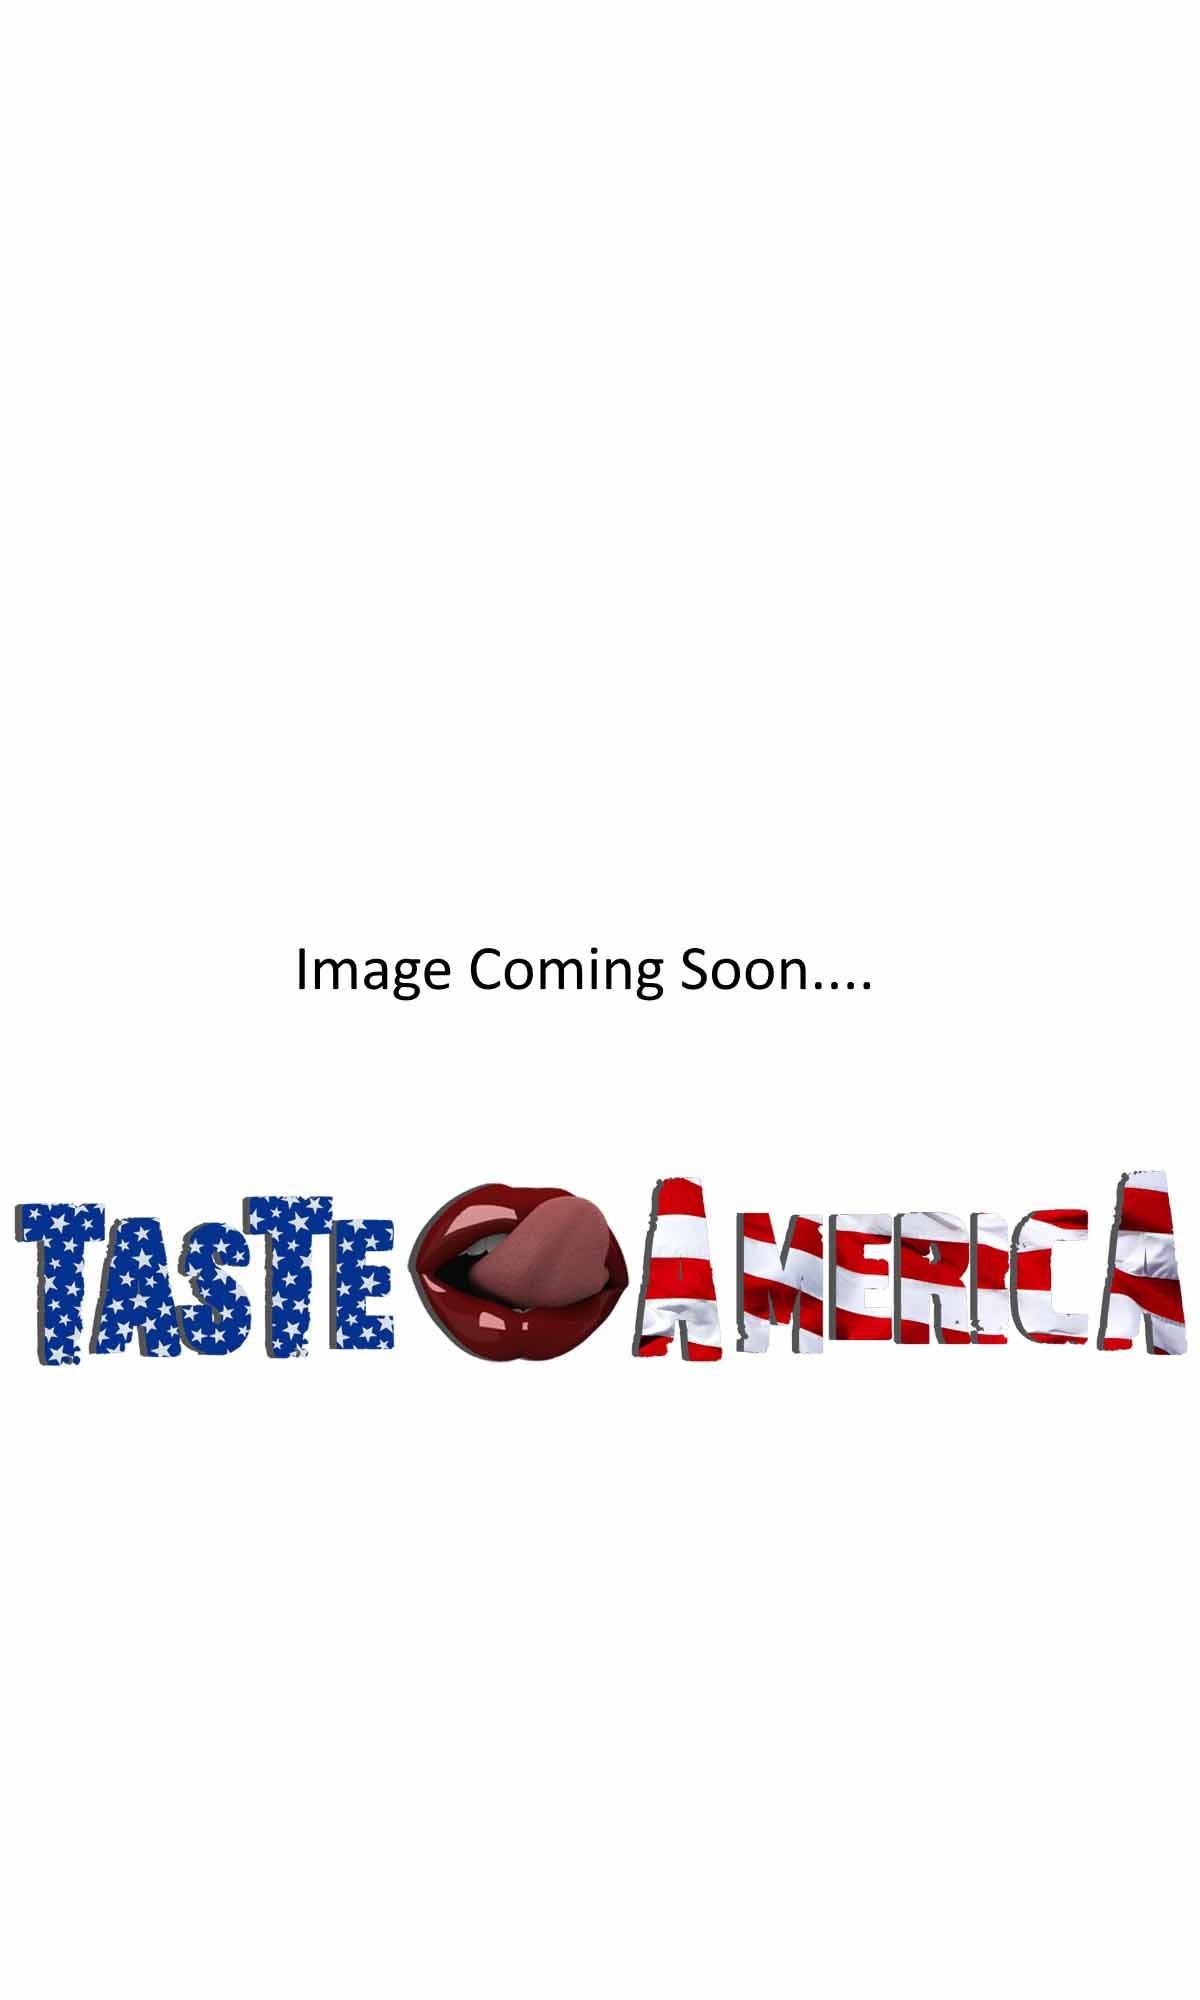 Buy Orbit Freeze Mint Gum Sugar Free Chewing Gum 14 Piece 3 Pack At Taste America UK